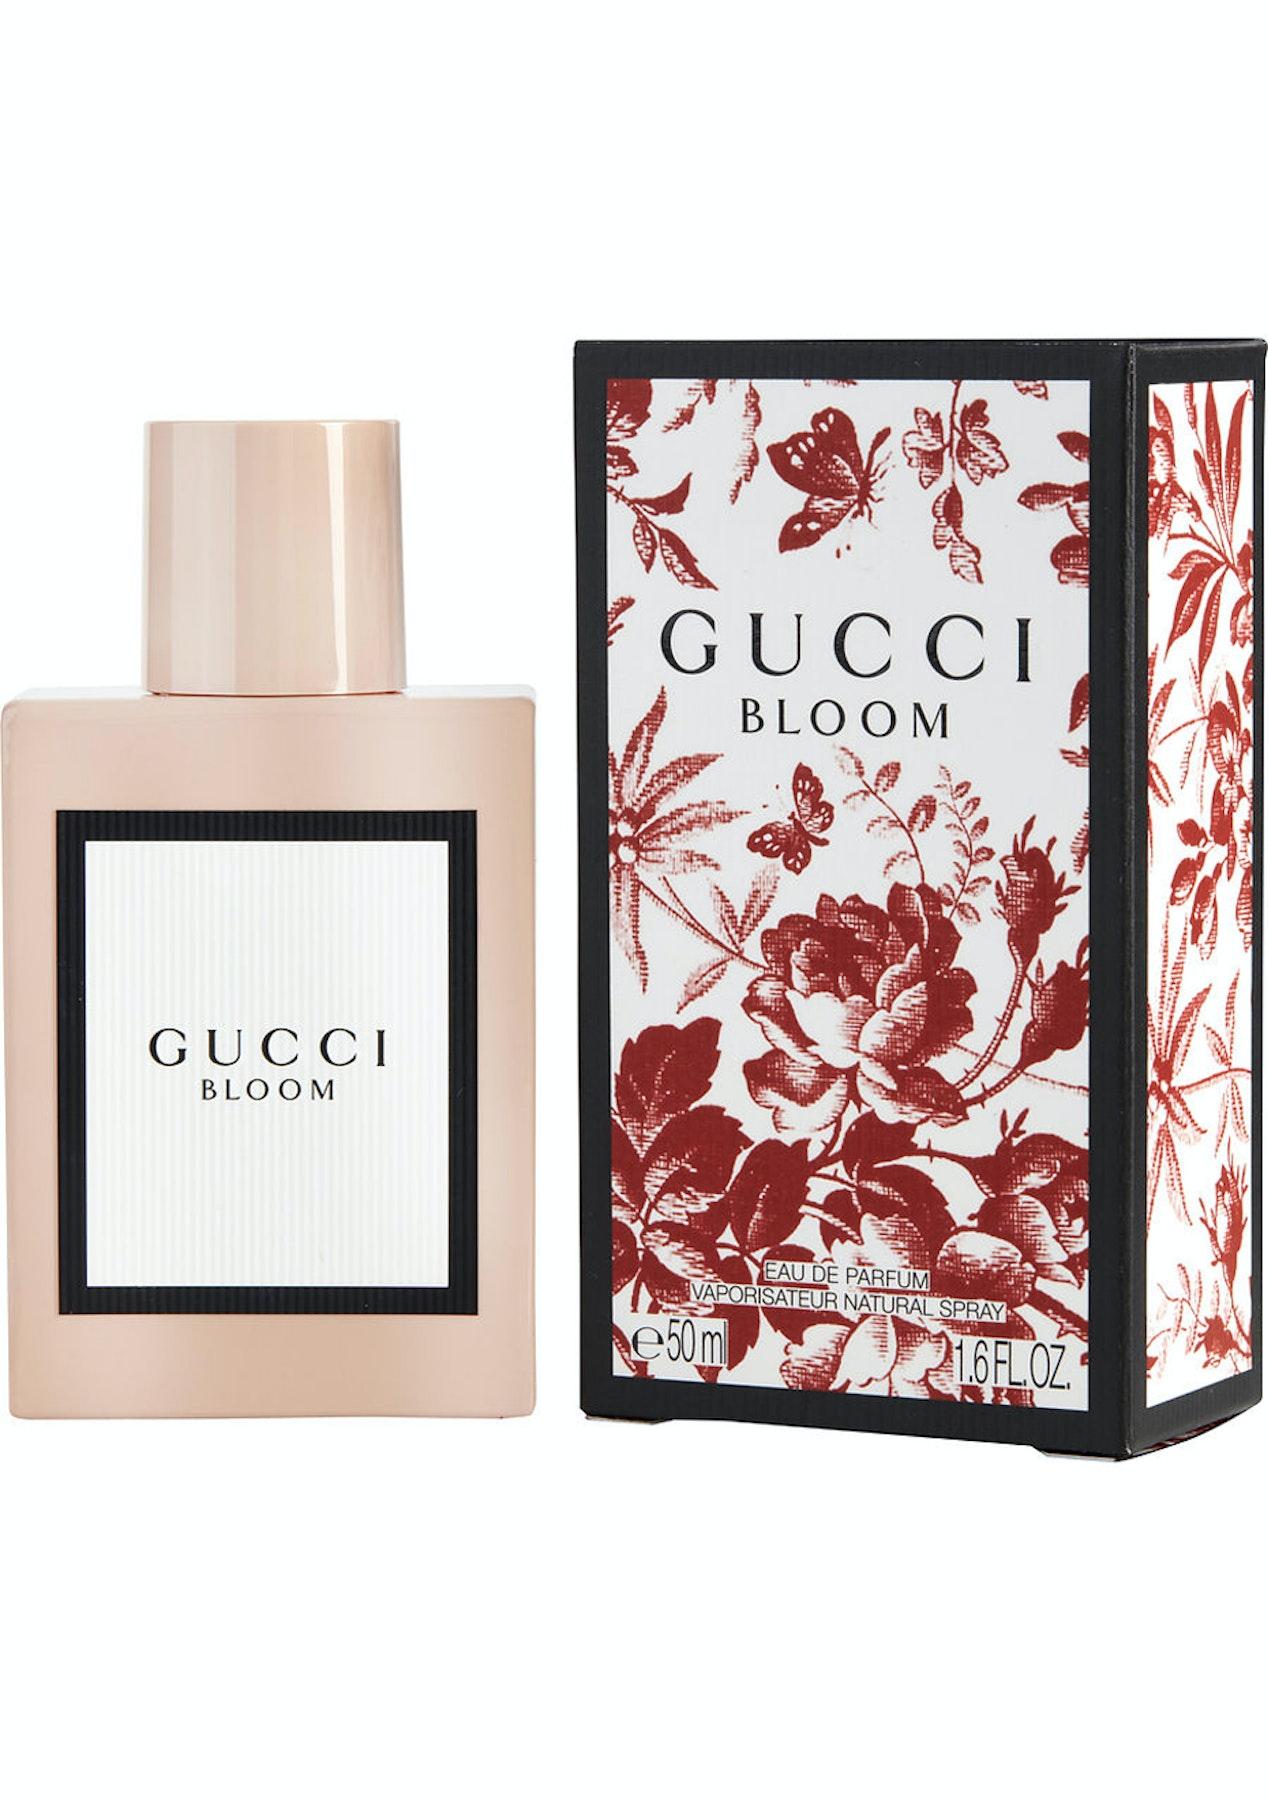 fbecb966935 Gucci Bloom EDP 50ml Spray - Free Shipping Beauty